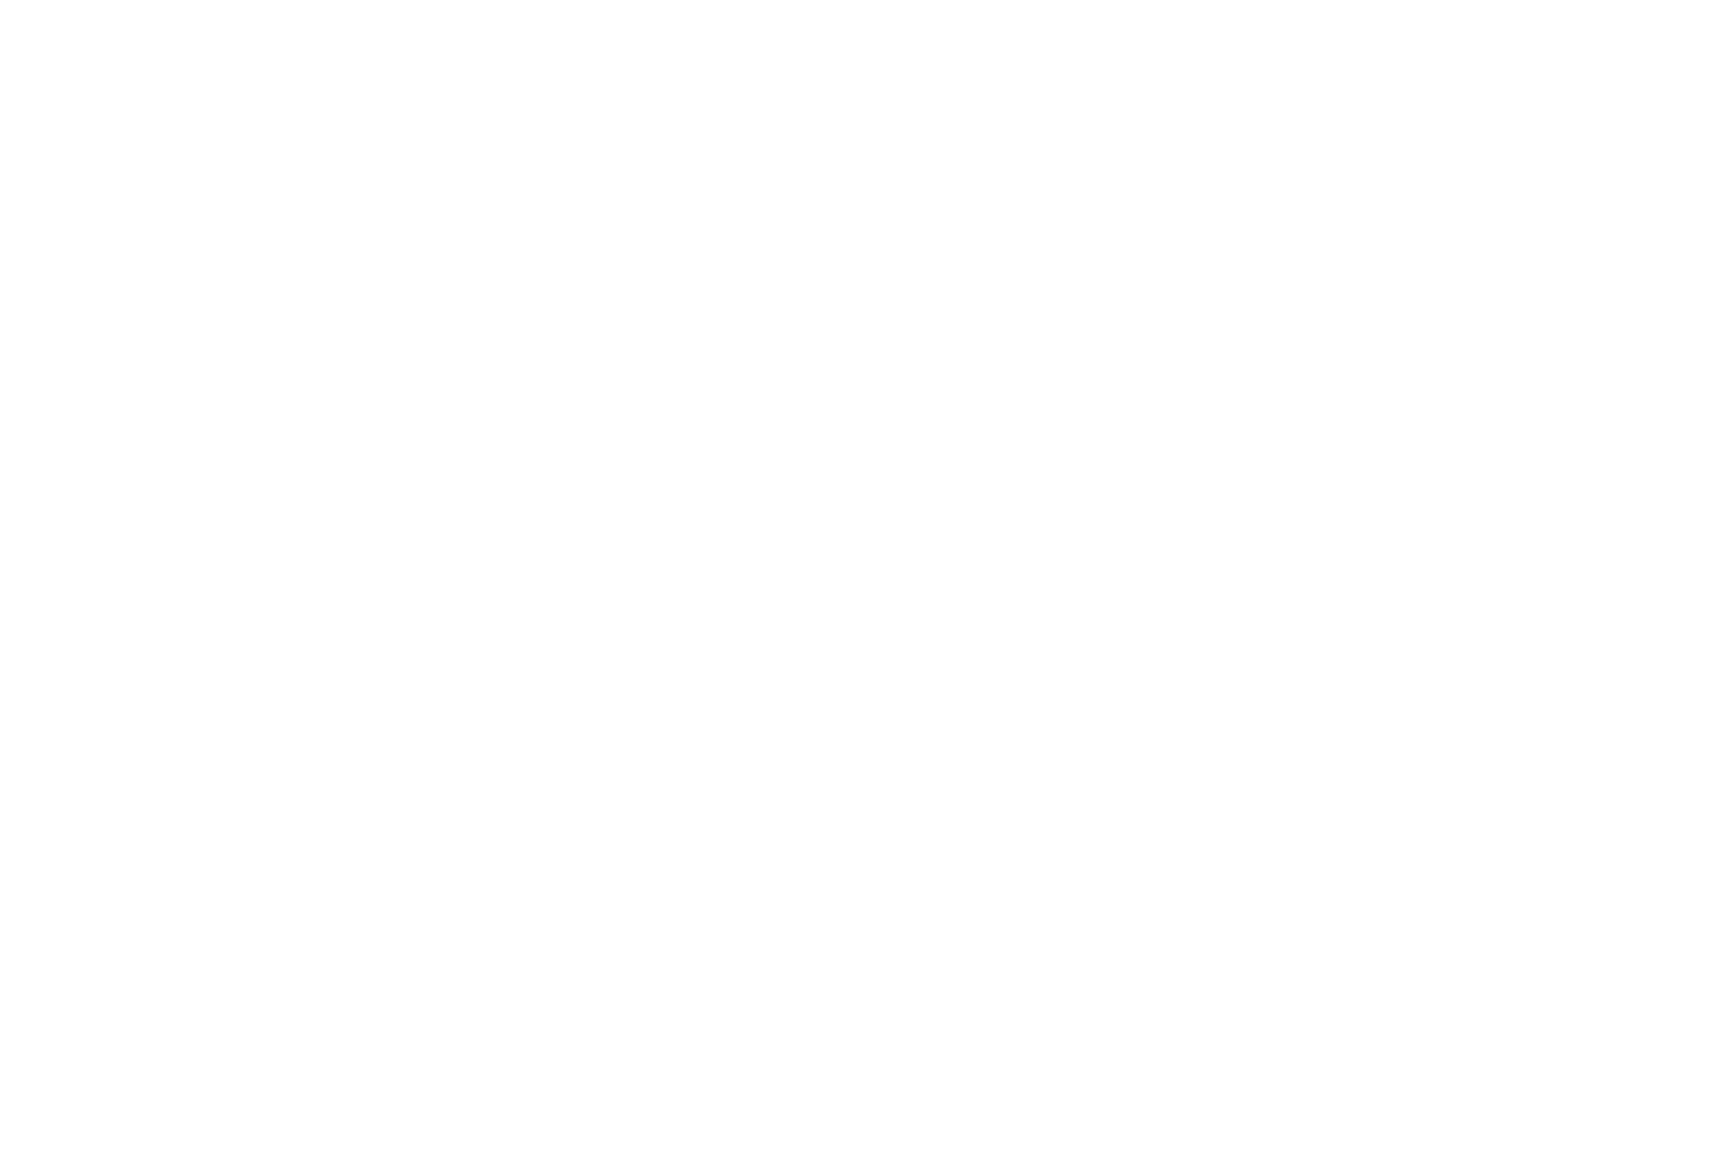 WINNER  - BEST INTERNATIONAL SHORT FILM  - ROMA CINEDOC 2016 (1).png